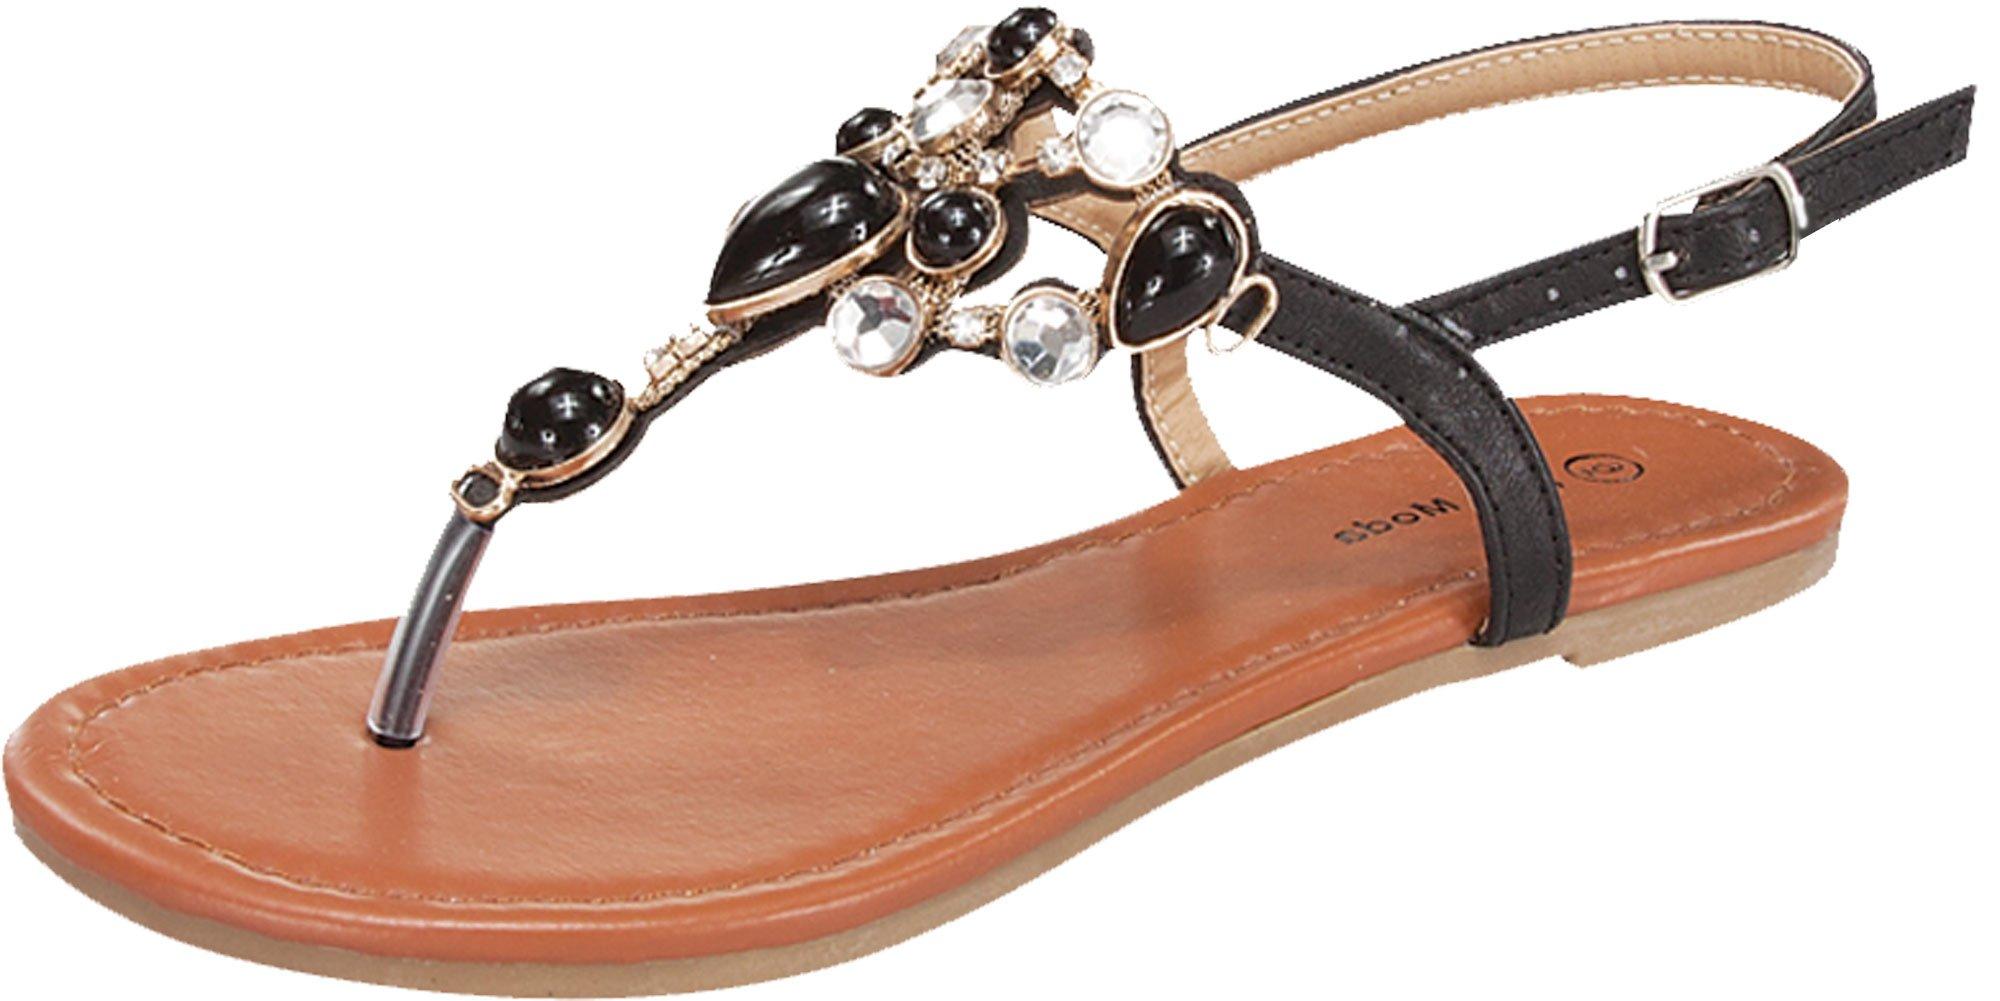 Top Moda Berry-9 Precious Gem Stone and Crystal Embellished Flat Sandal - Black 8